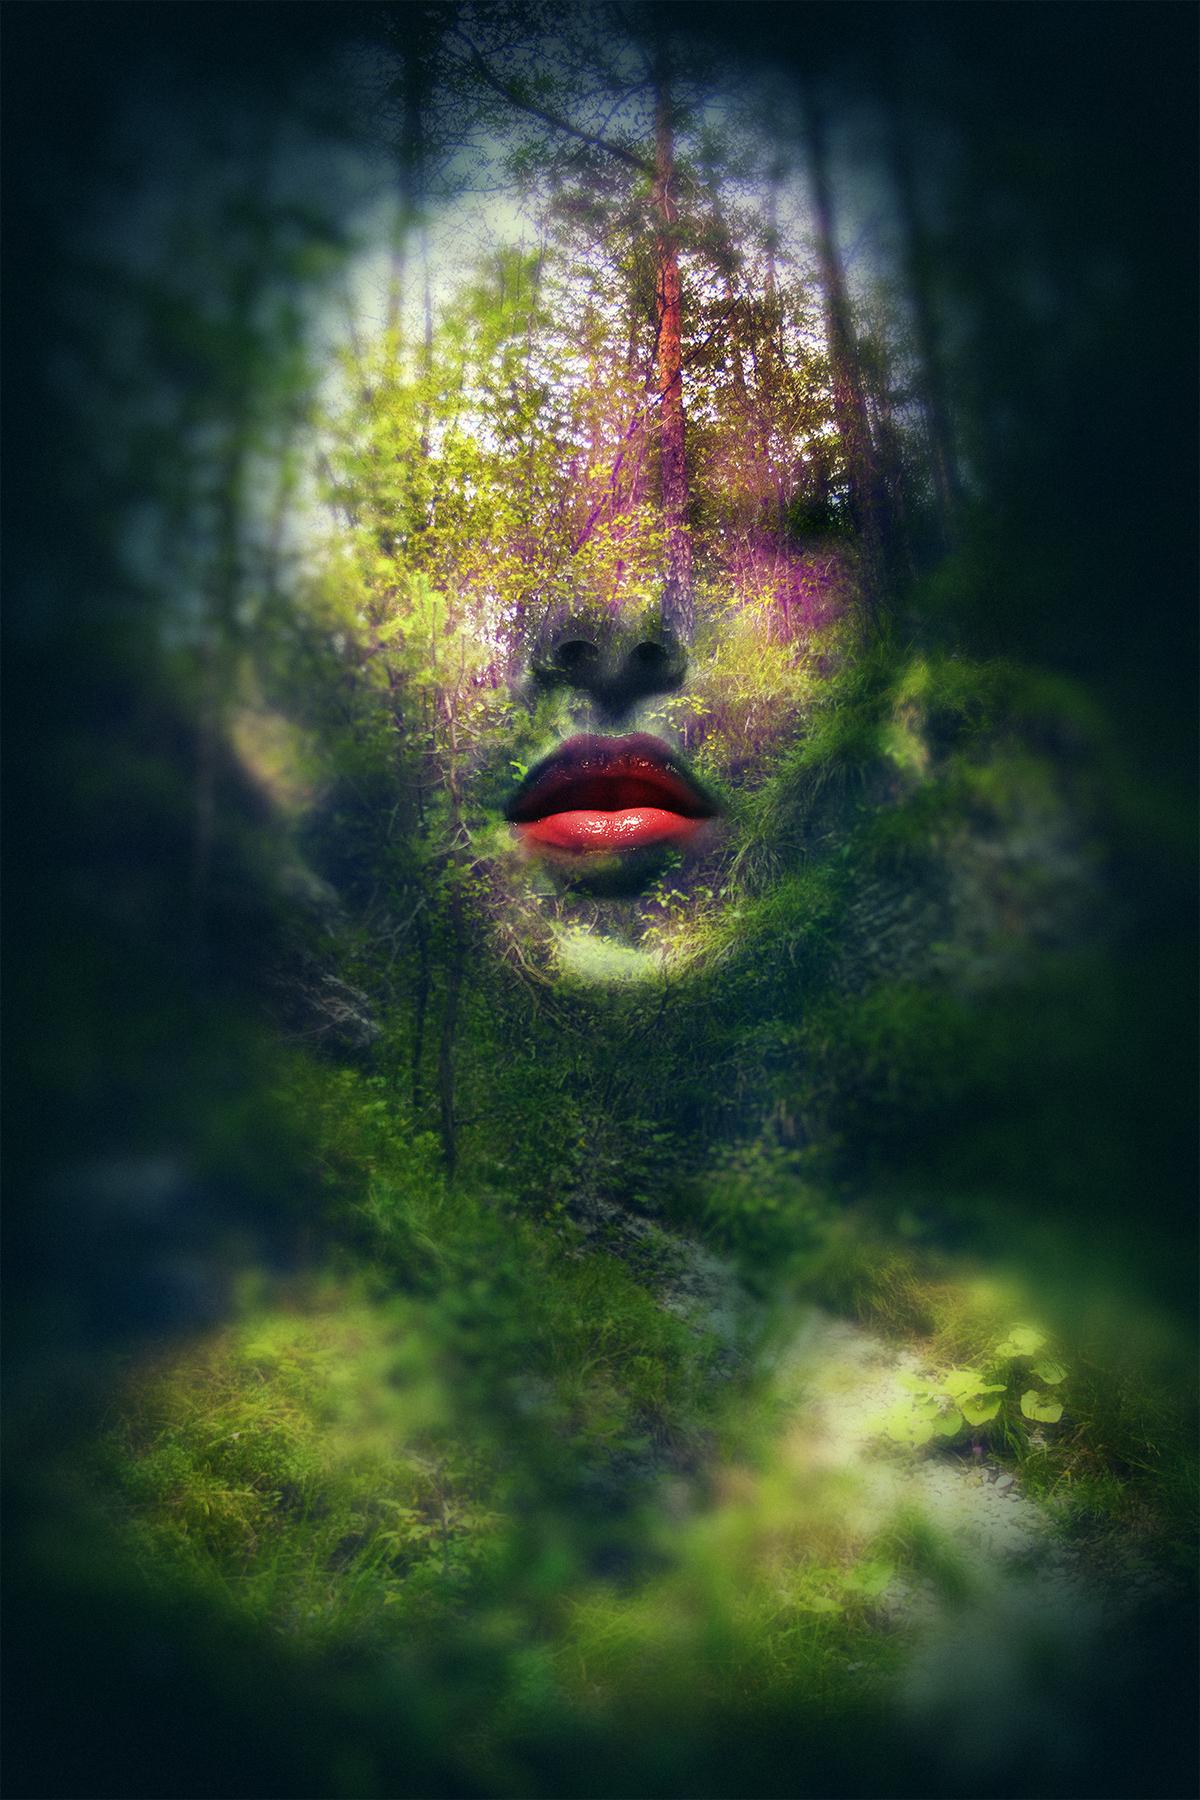 Unforgivable mistakes, digital art by Federico Bebber